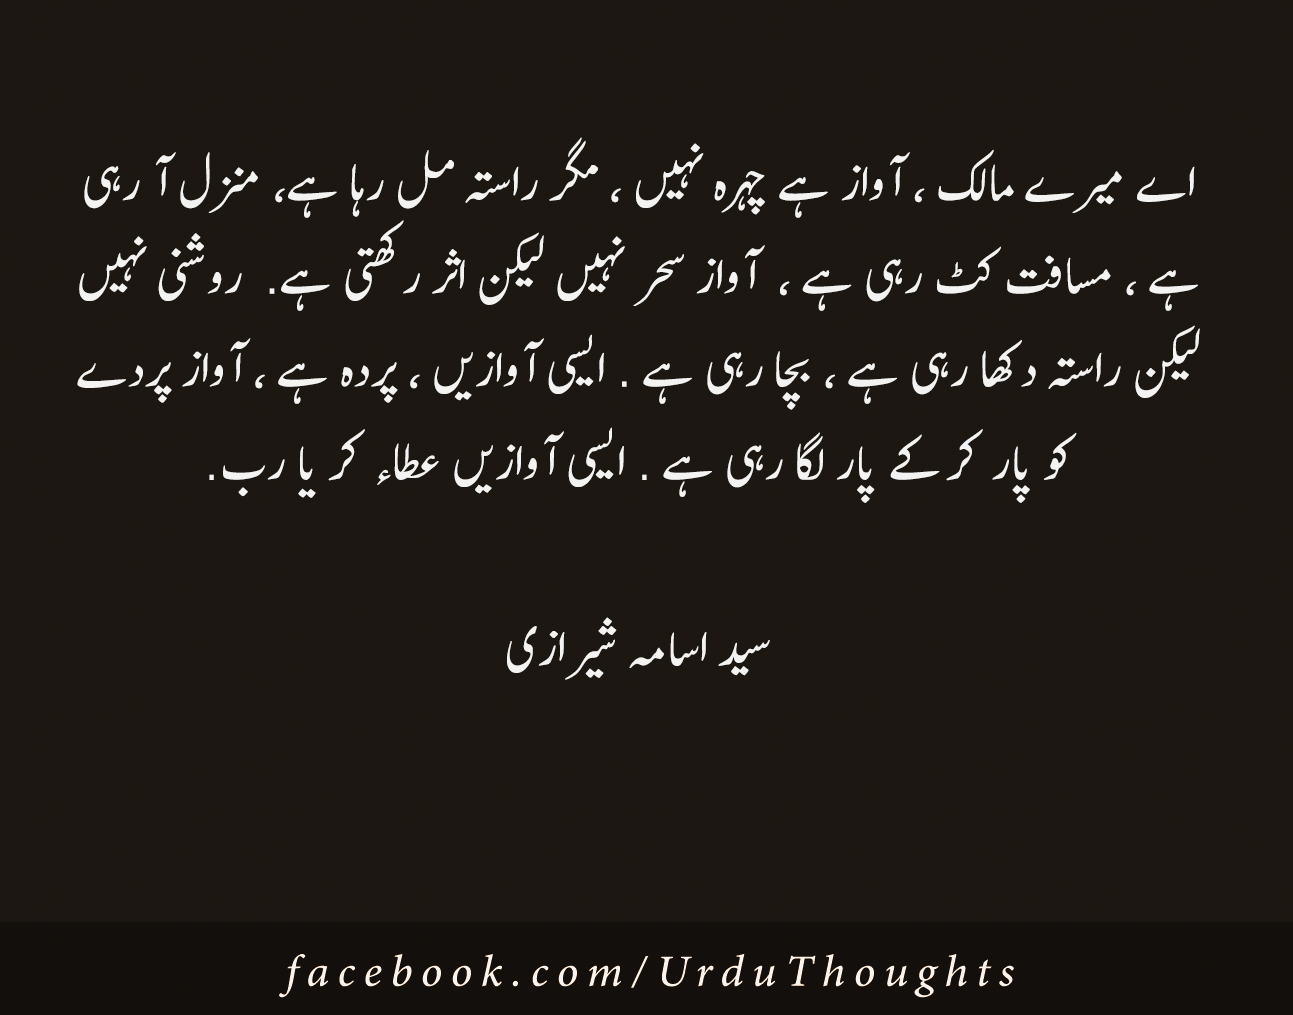 Zindagi ki Achi Batain In Urdu | Quotes On Life Urdu - Urdu